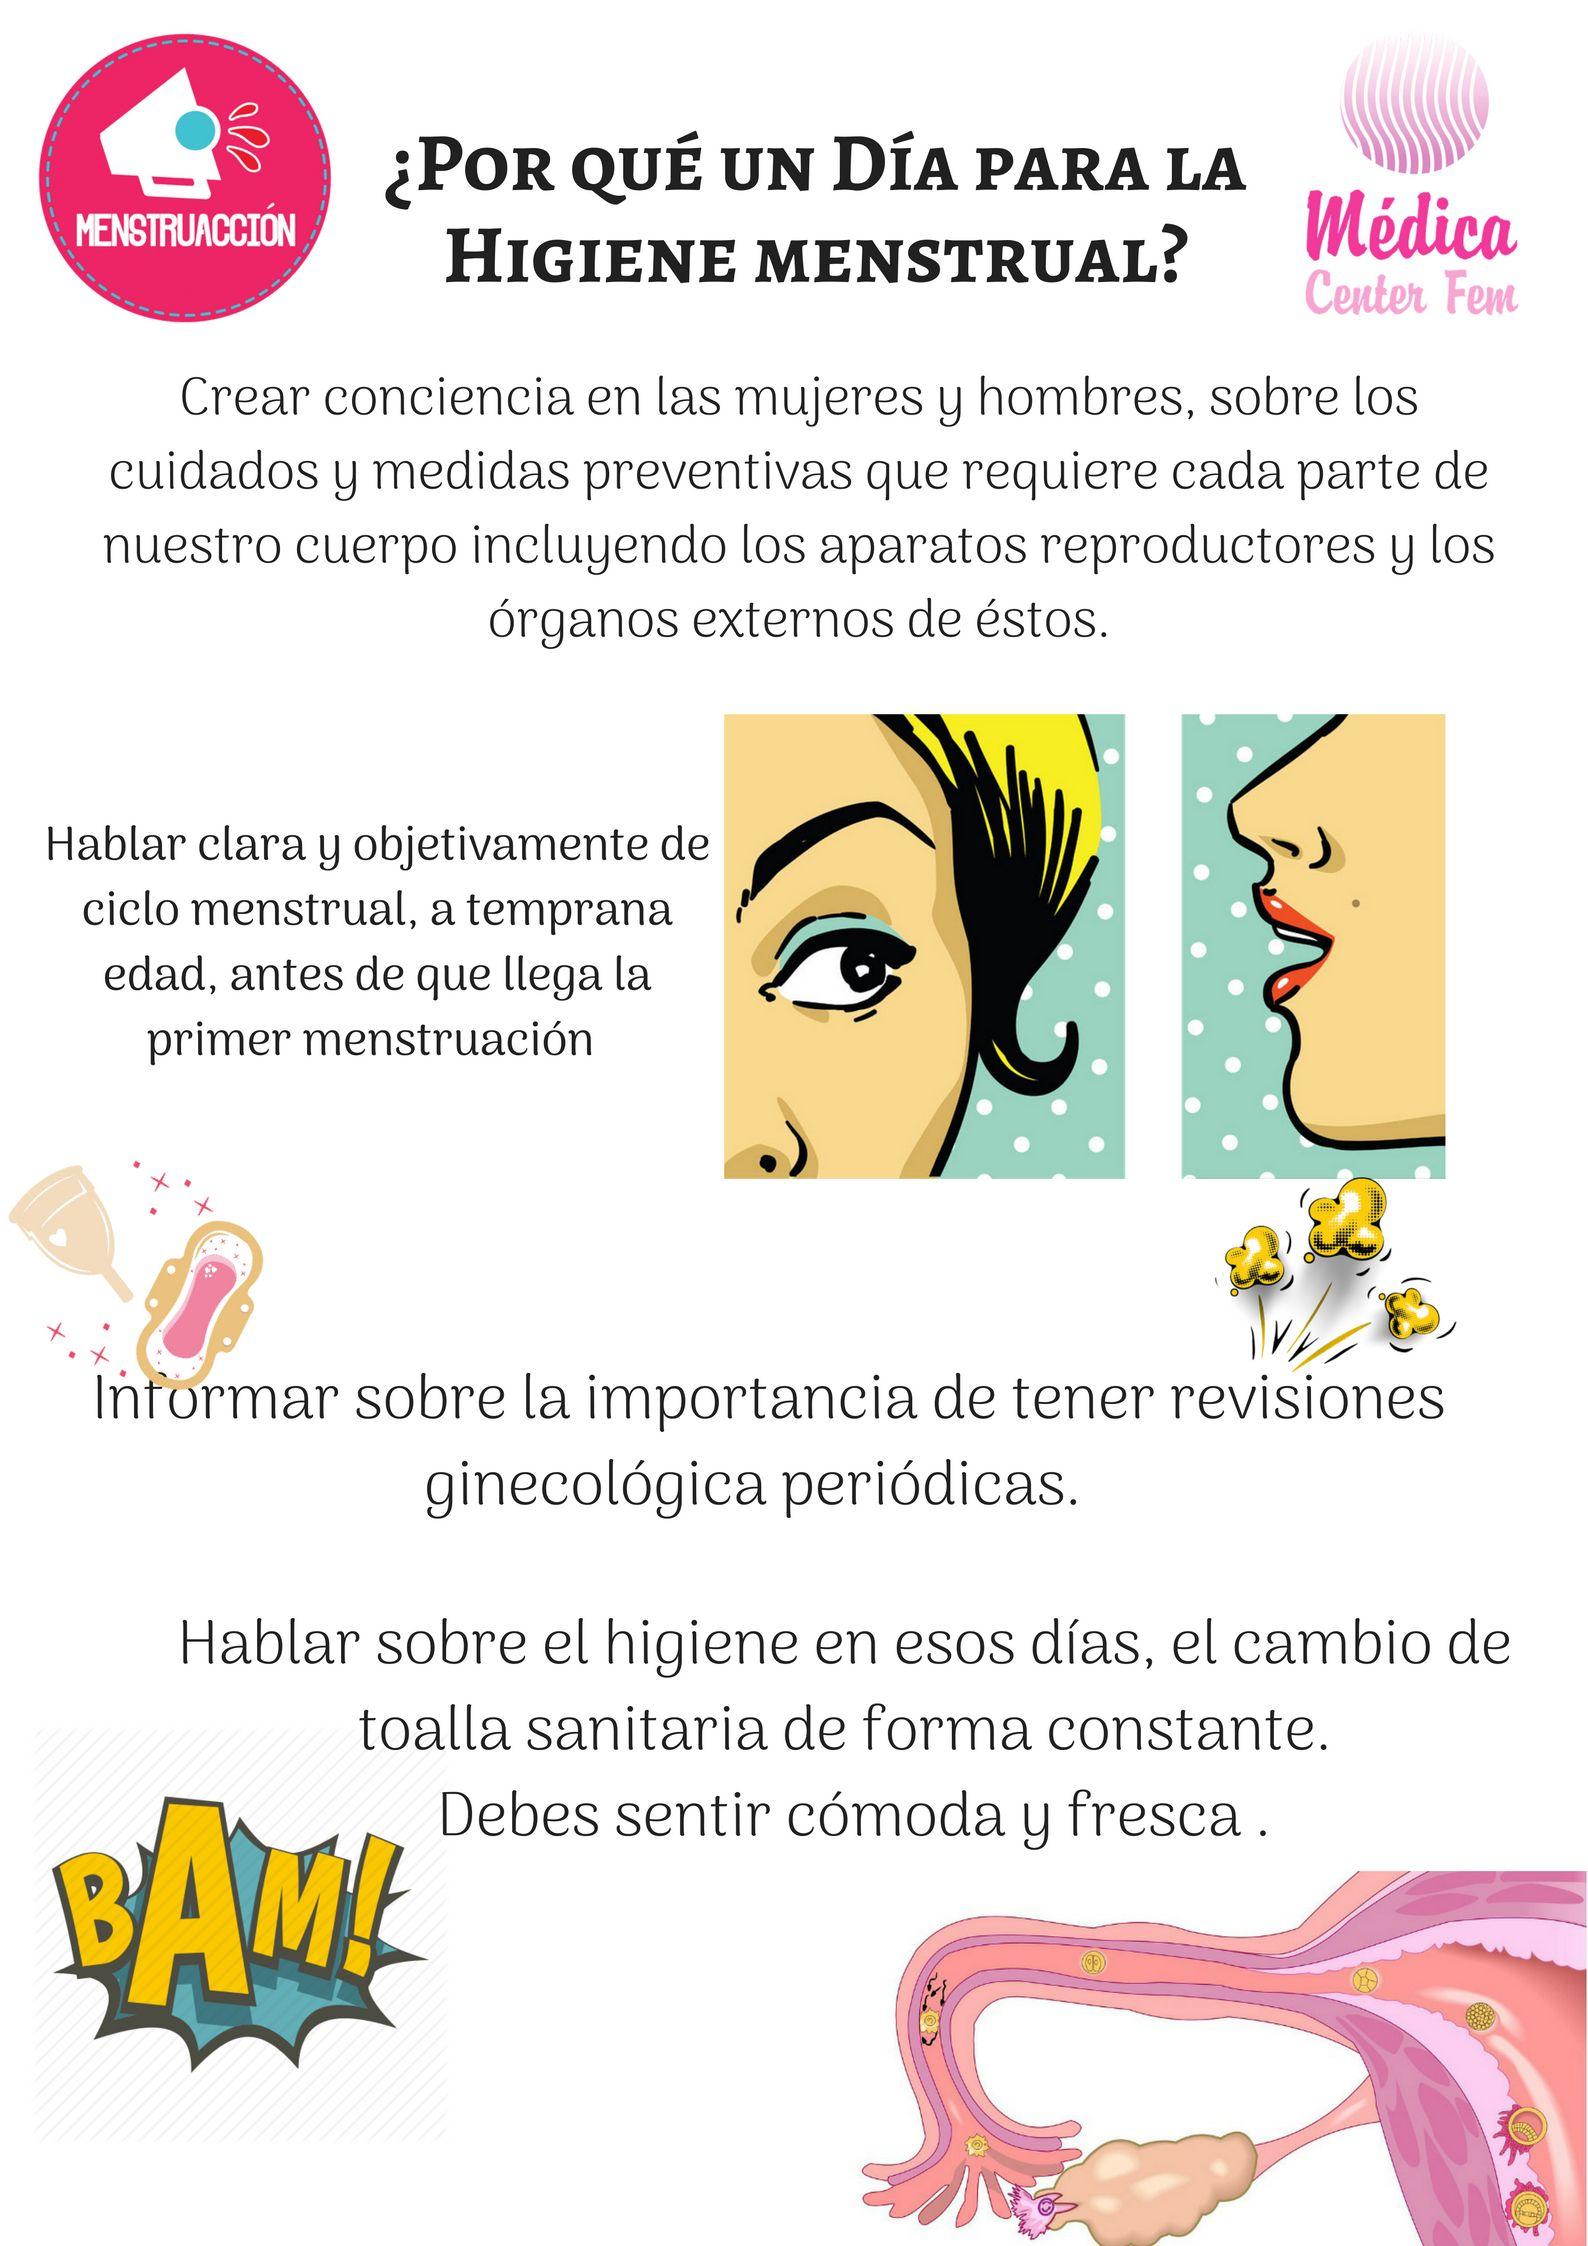 Aparato reproductor femenino : Sistema reproductor femenino | Pinterest